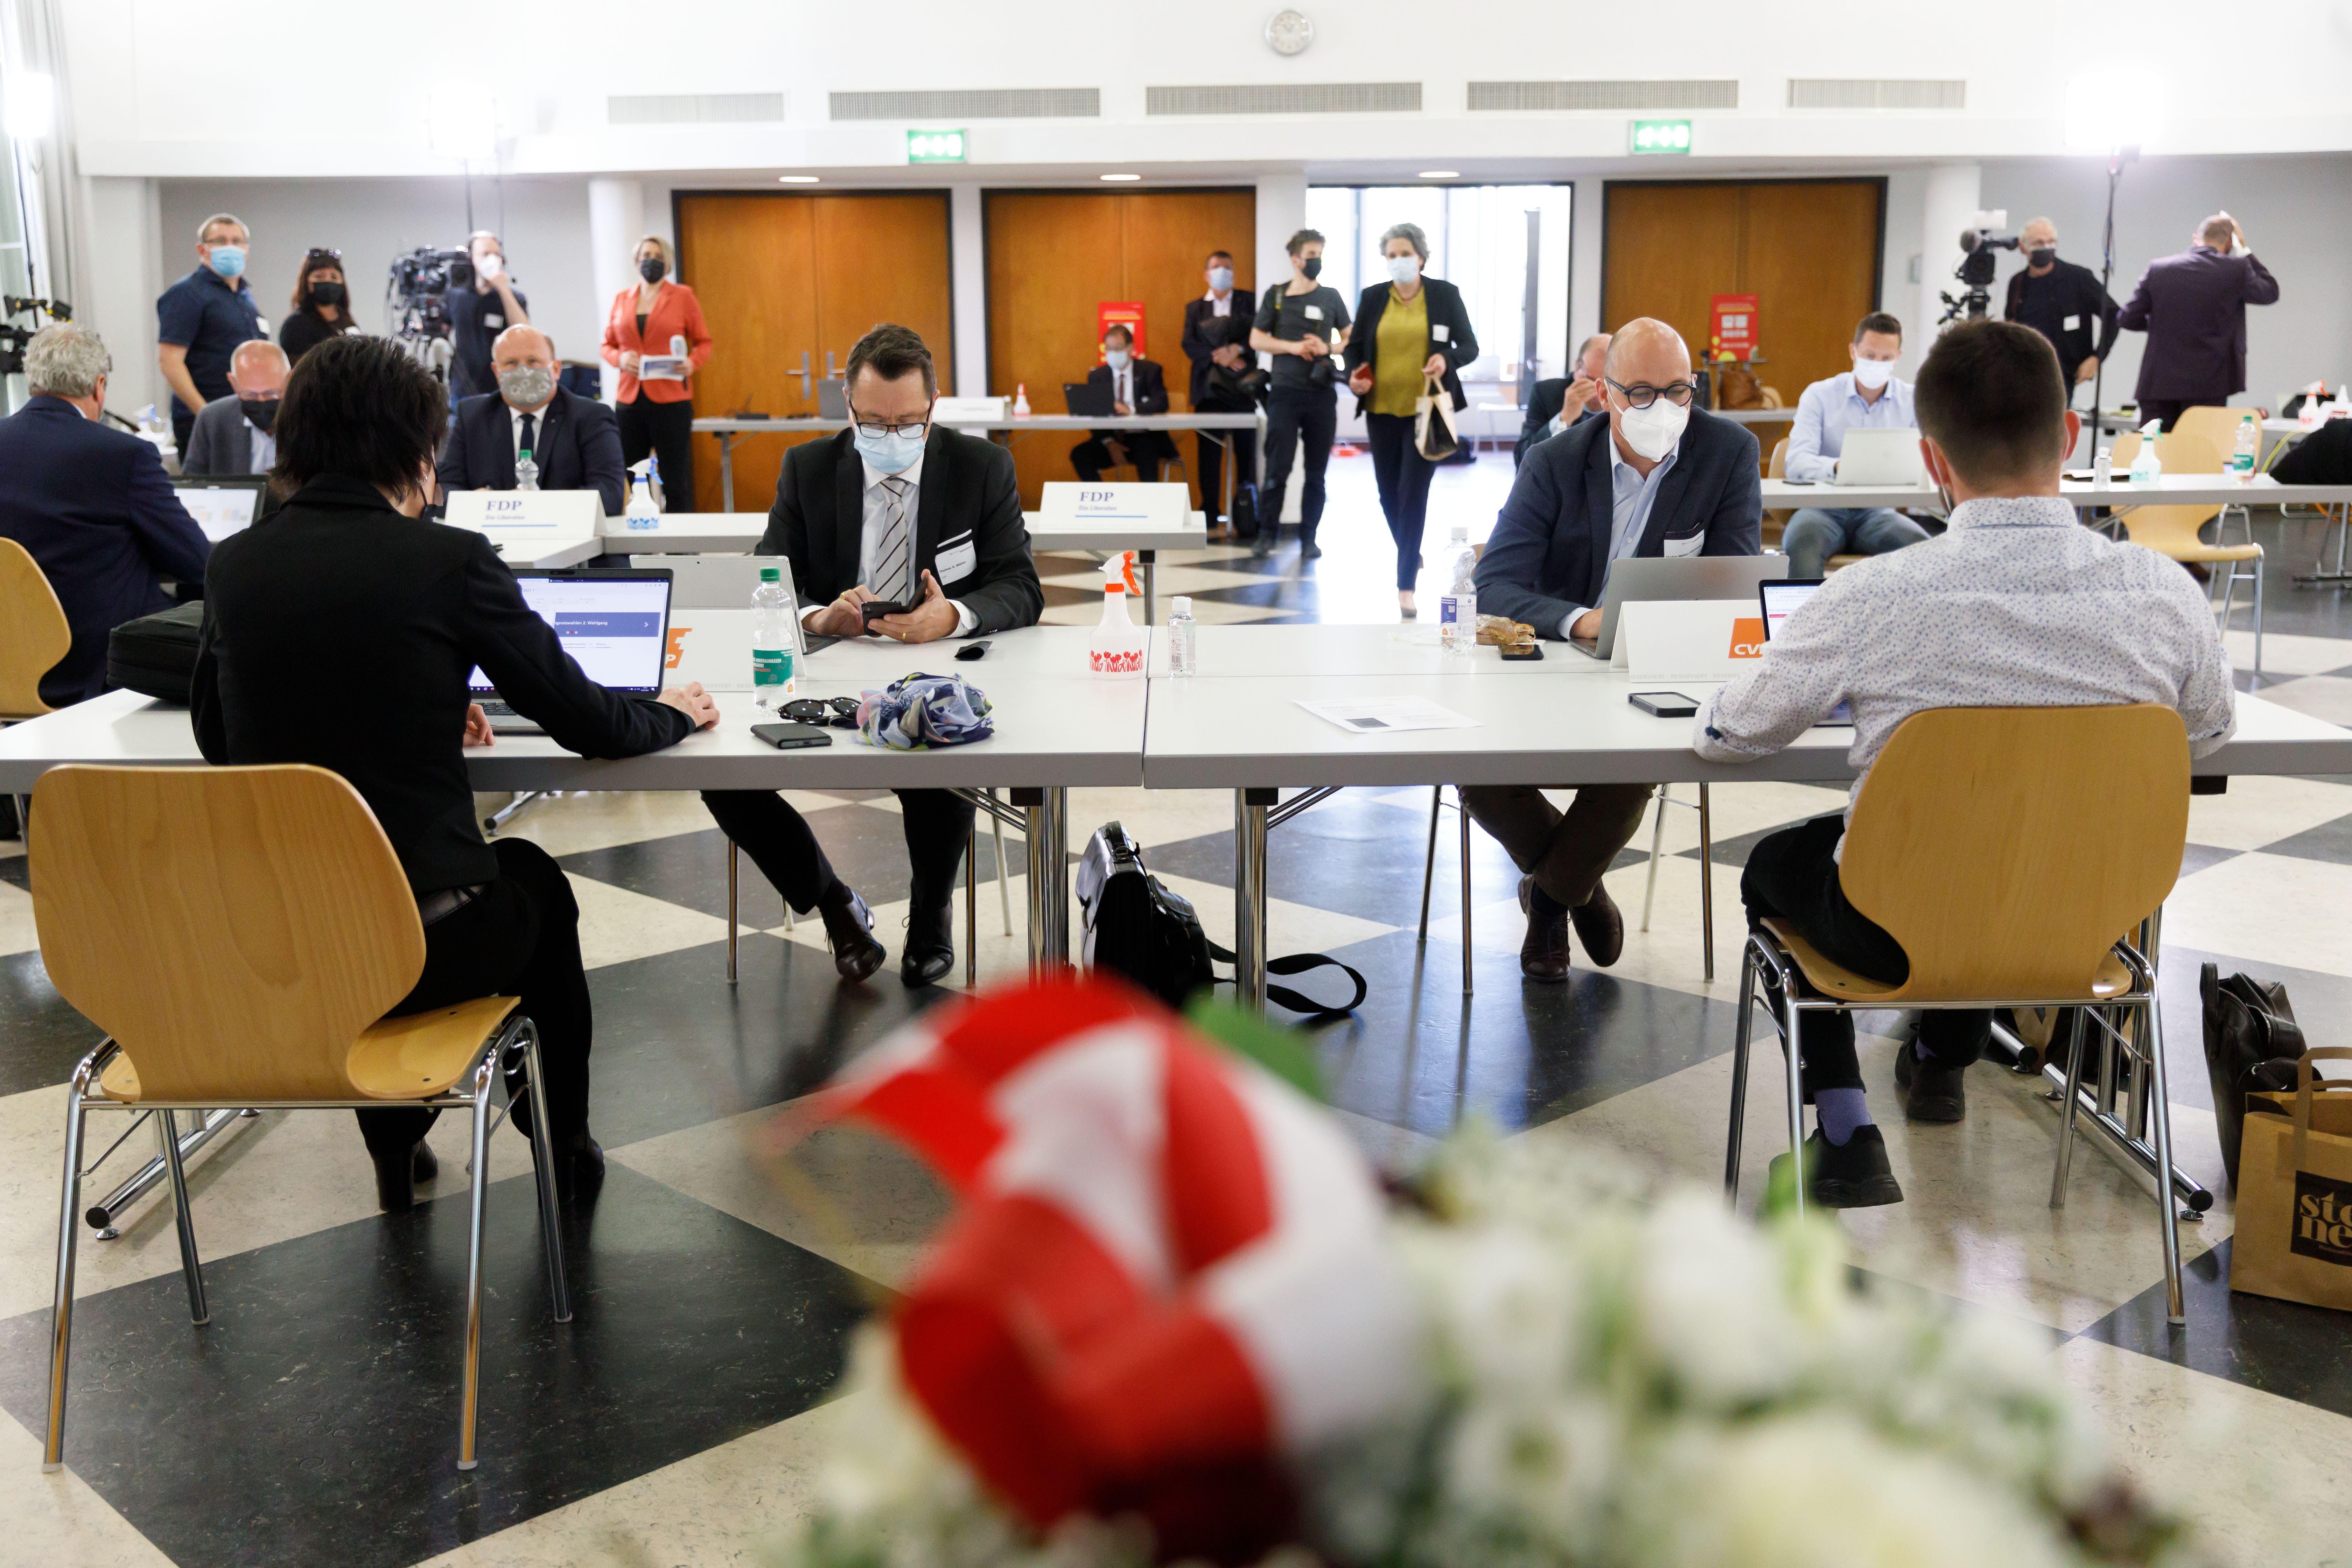 Regierungsratswahlen 2. Wahlgang: Blick ins Wahlzentrum.